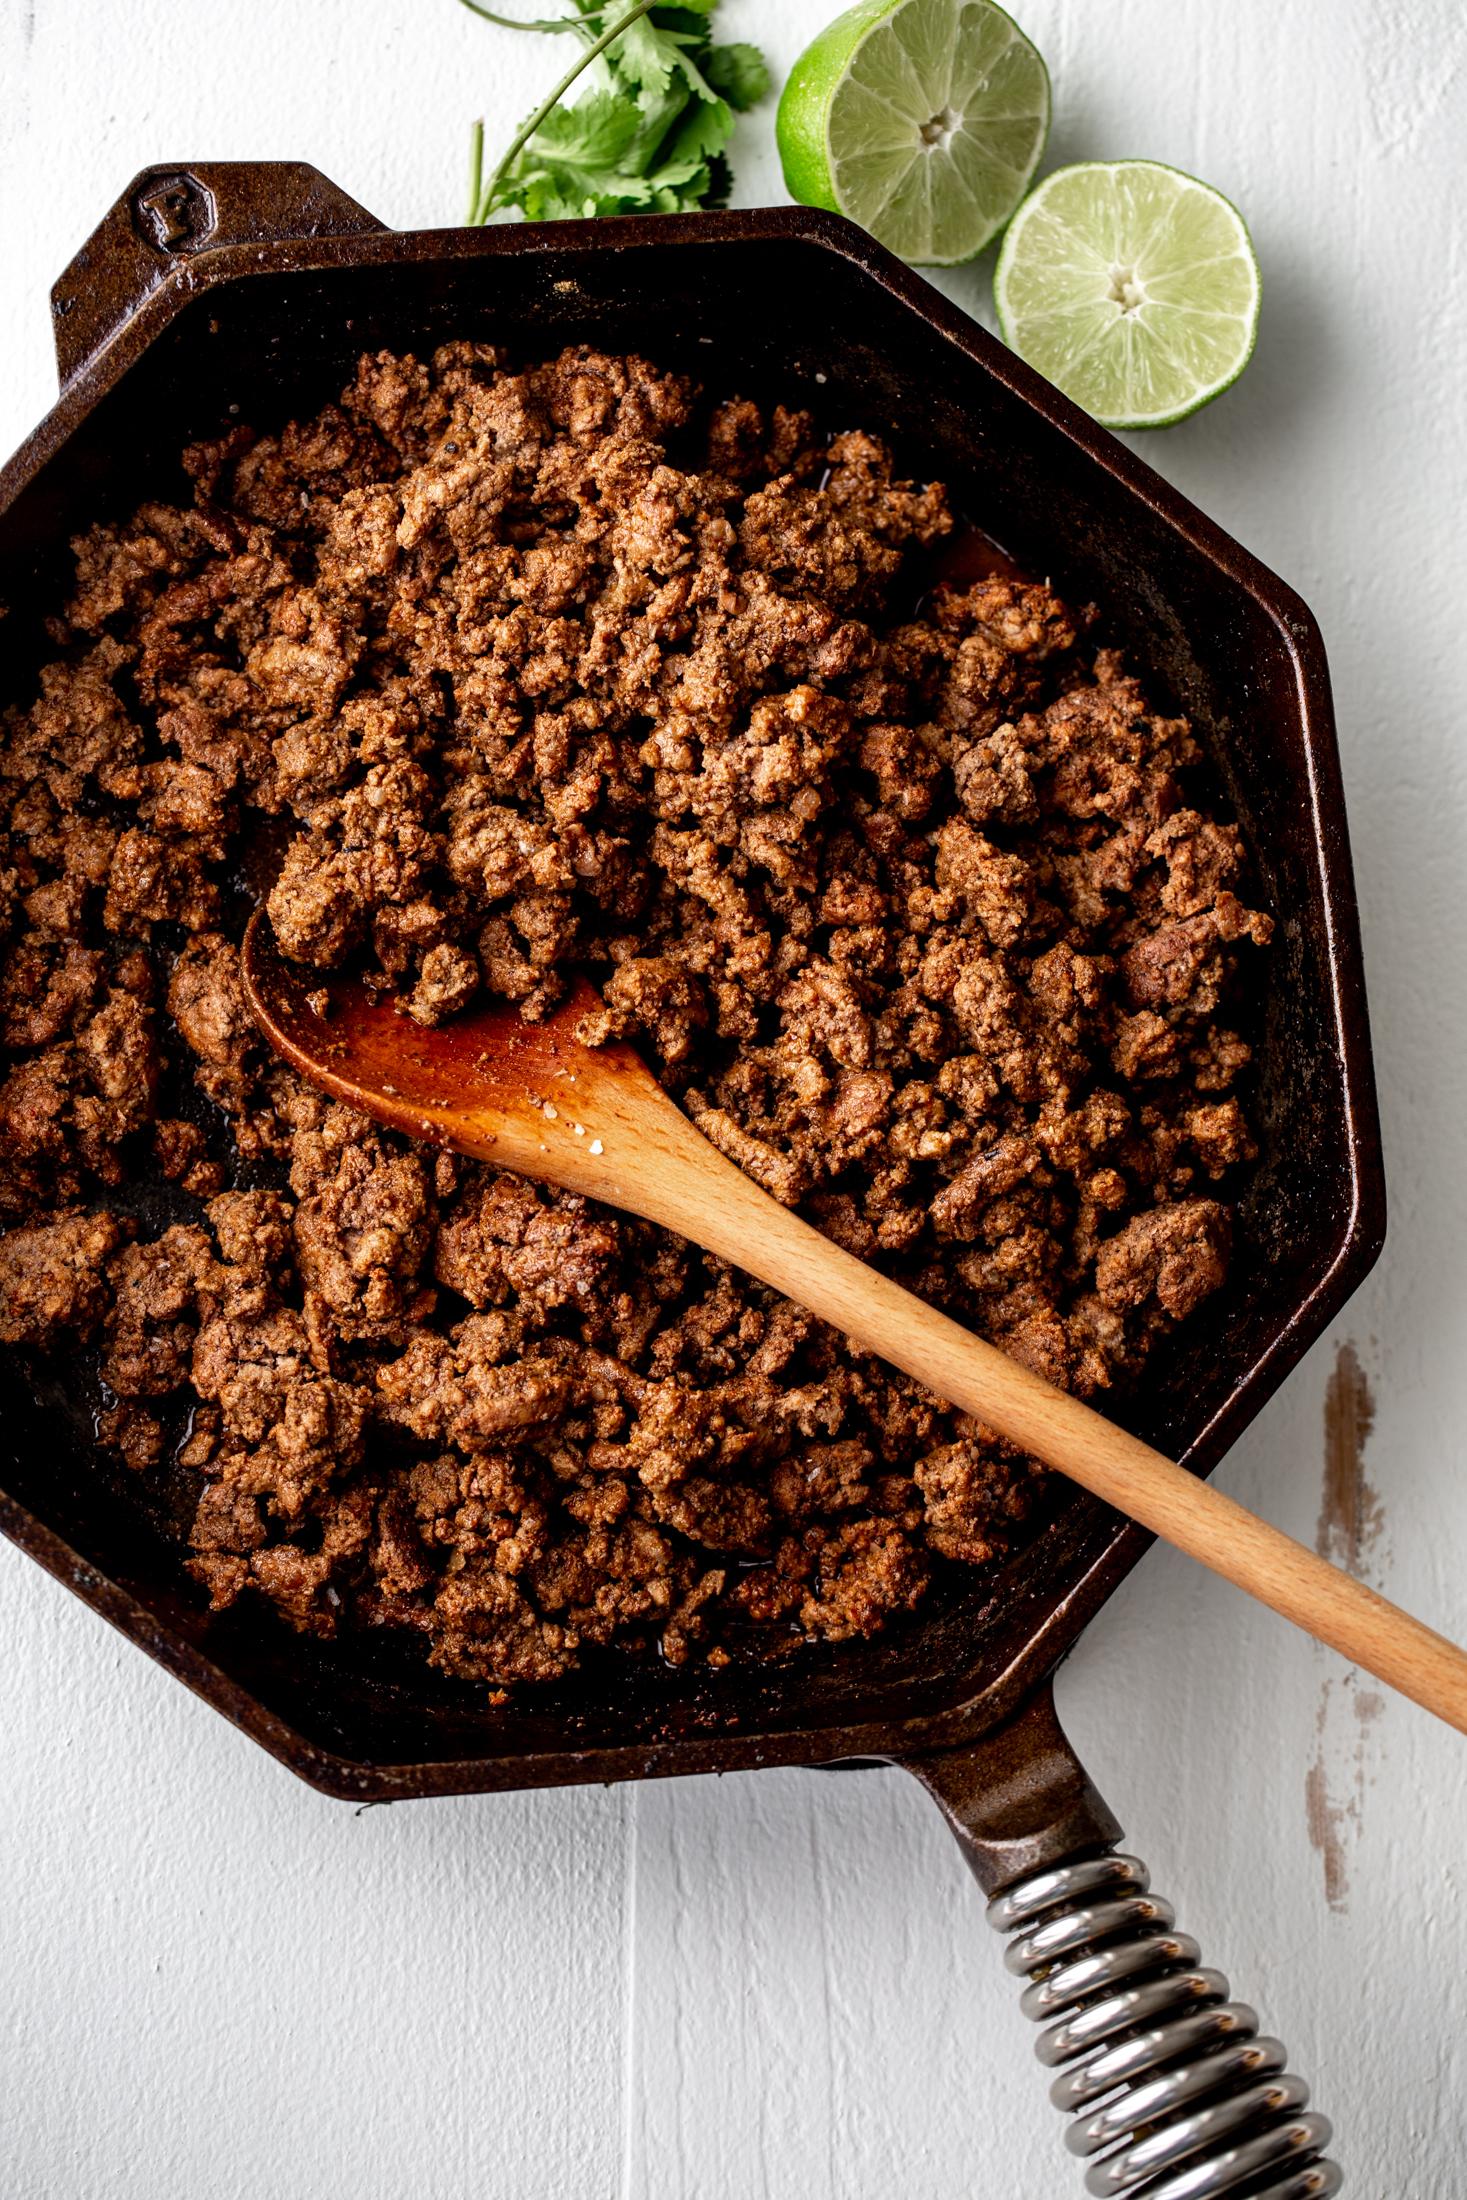 homemade crunch wrap supreme ingredients